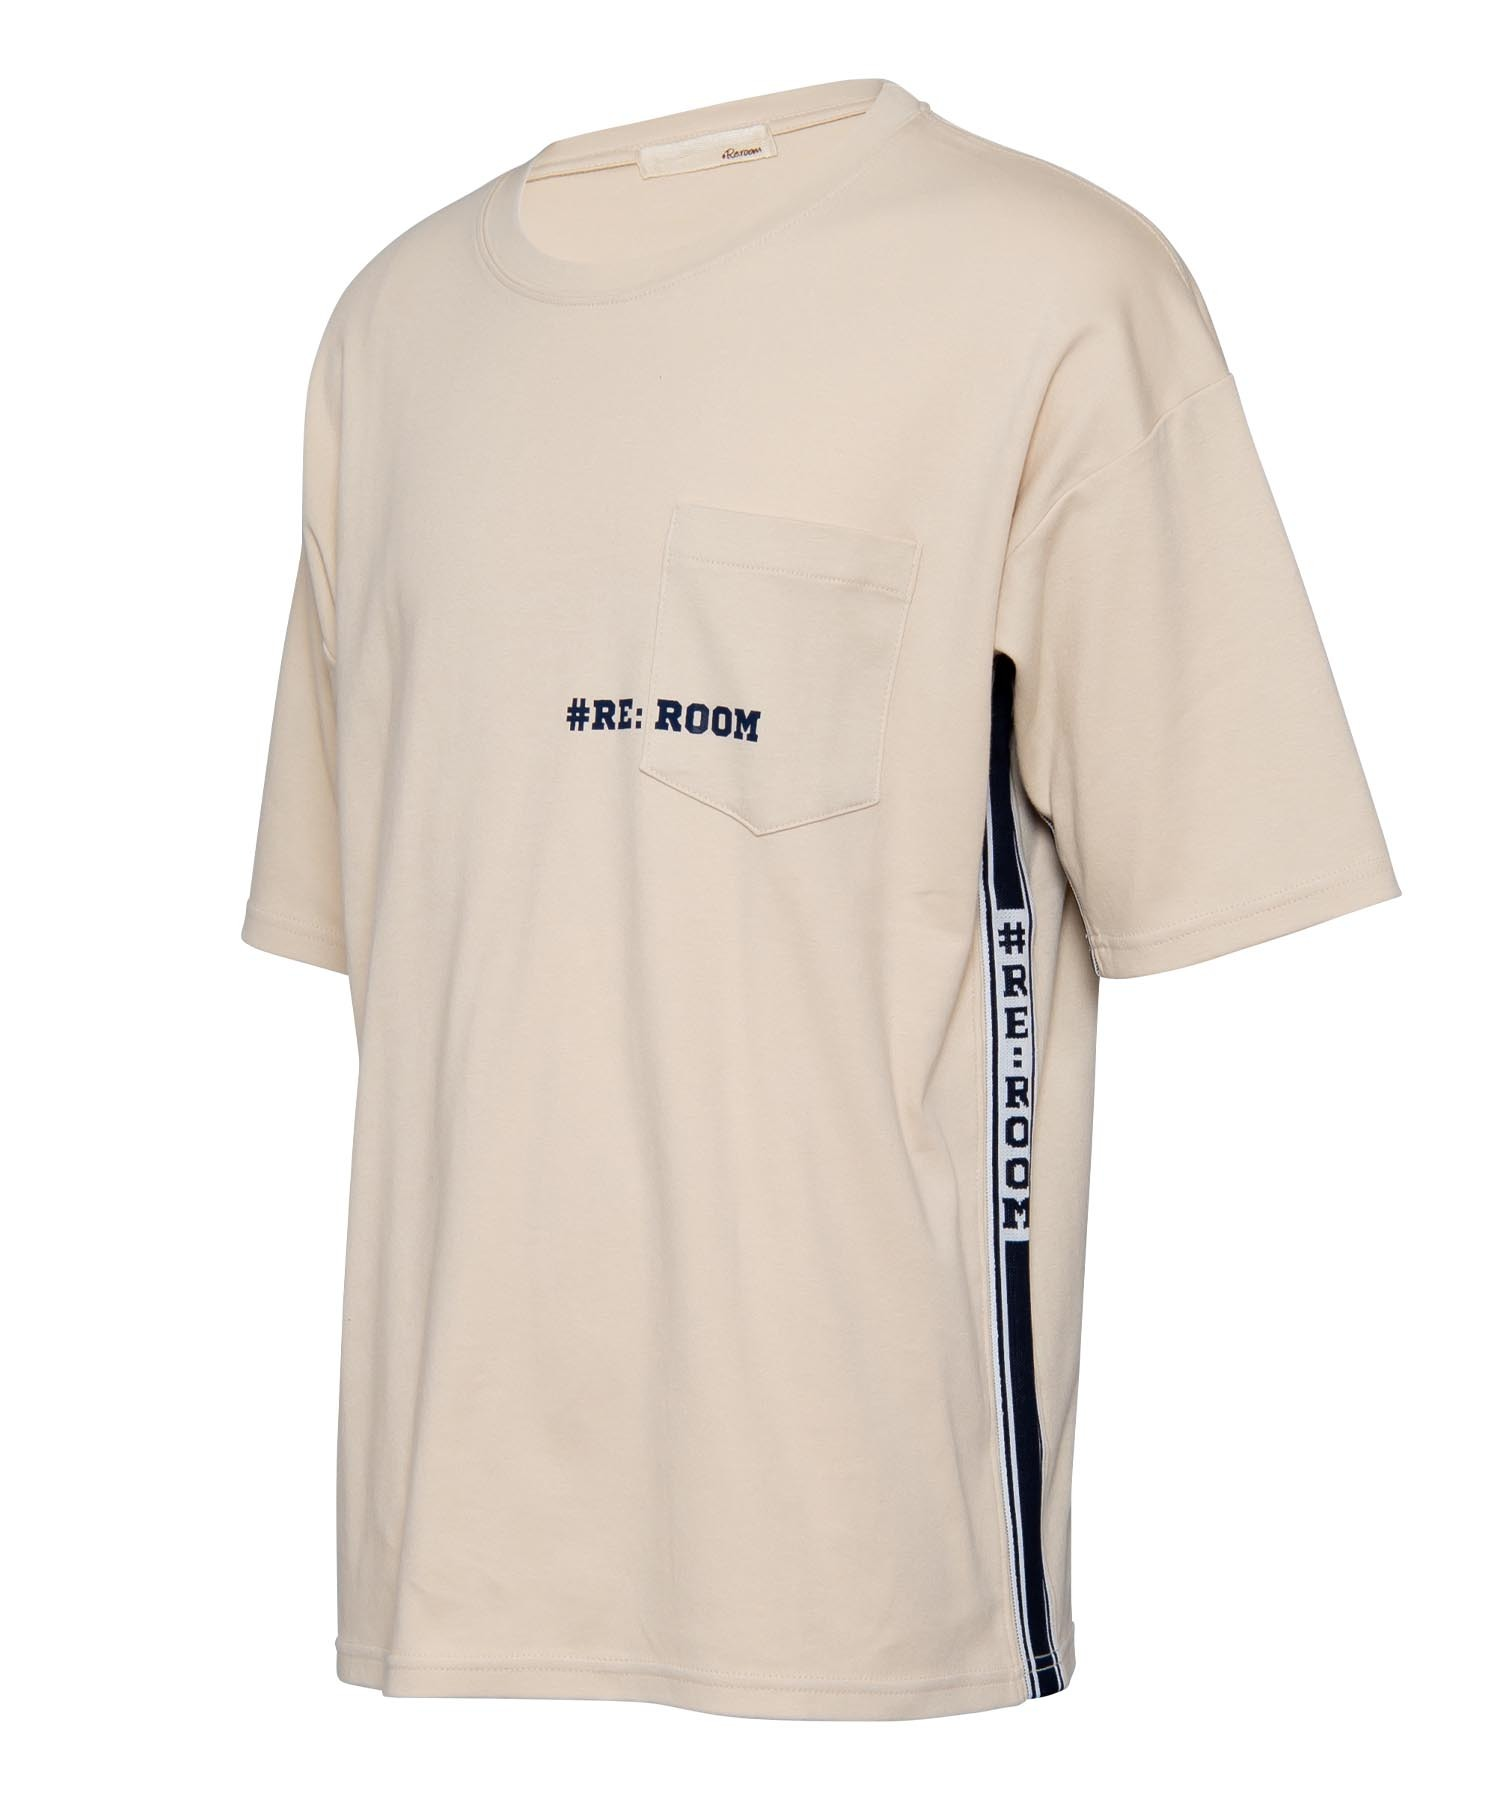 SIDE LINE LOGO BIG T-shirt[REC295]